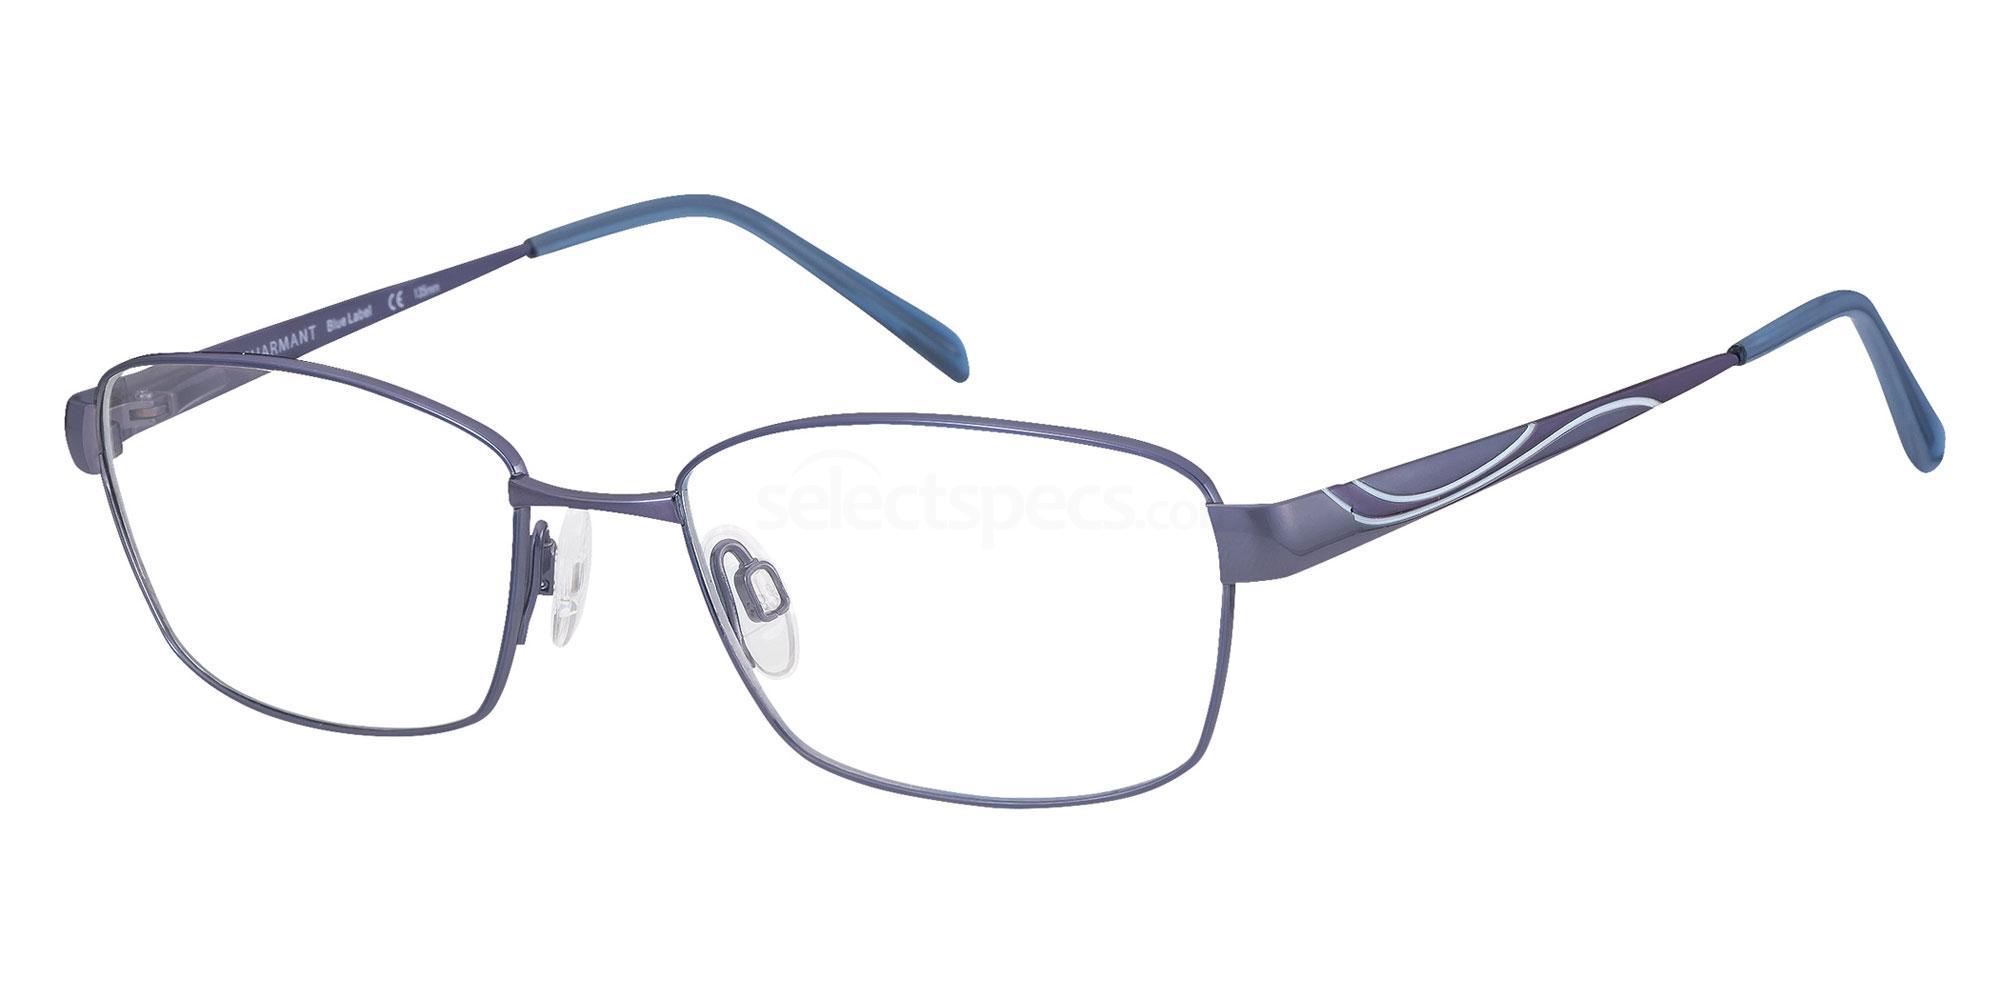 BL CH16034 Glasses, Charmant Blue Label